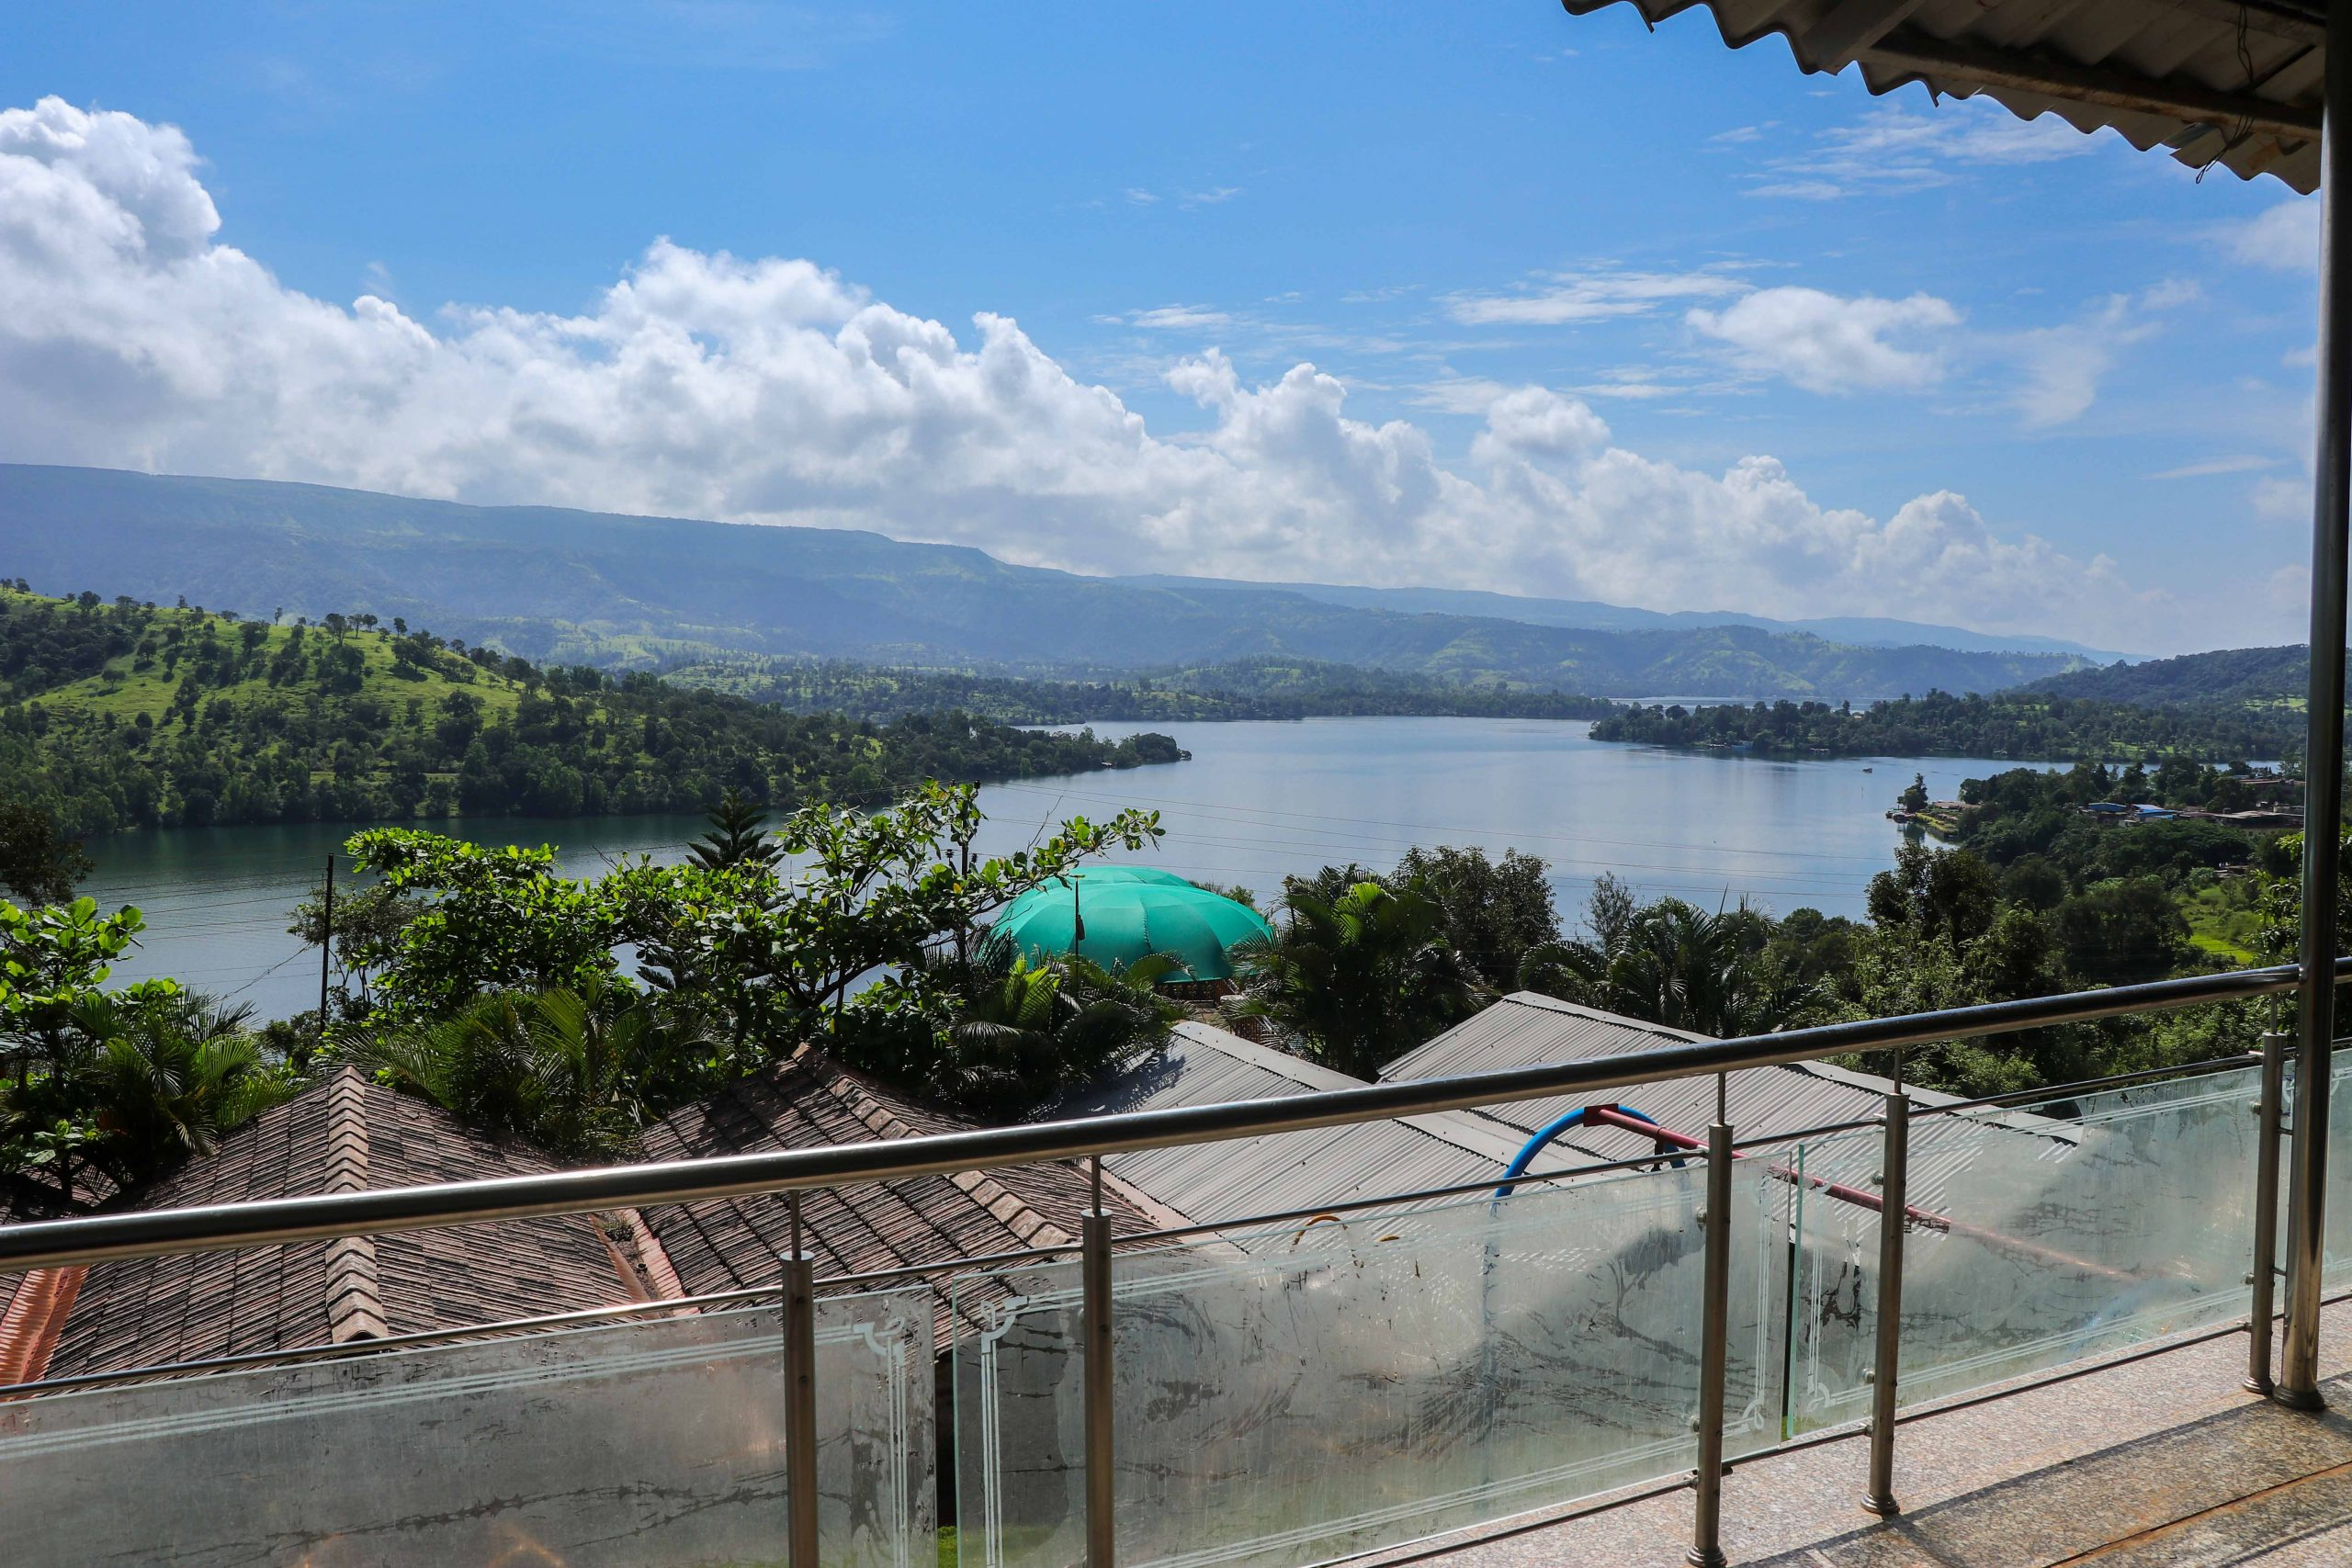 Nisarga Agro Tourism, Tapola, Mahabaleshwar lake view from room sitout